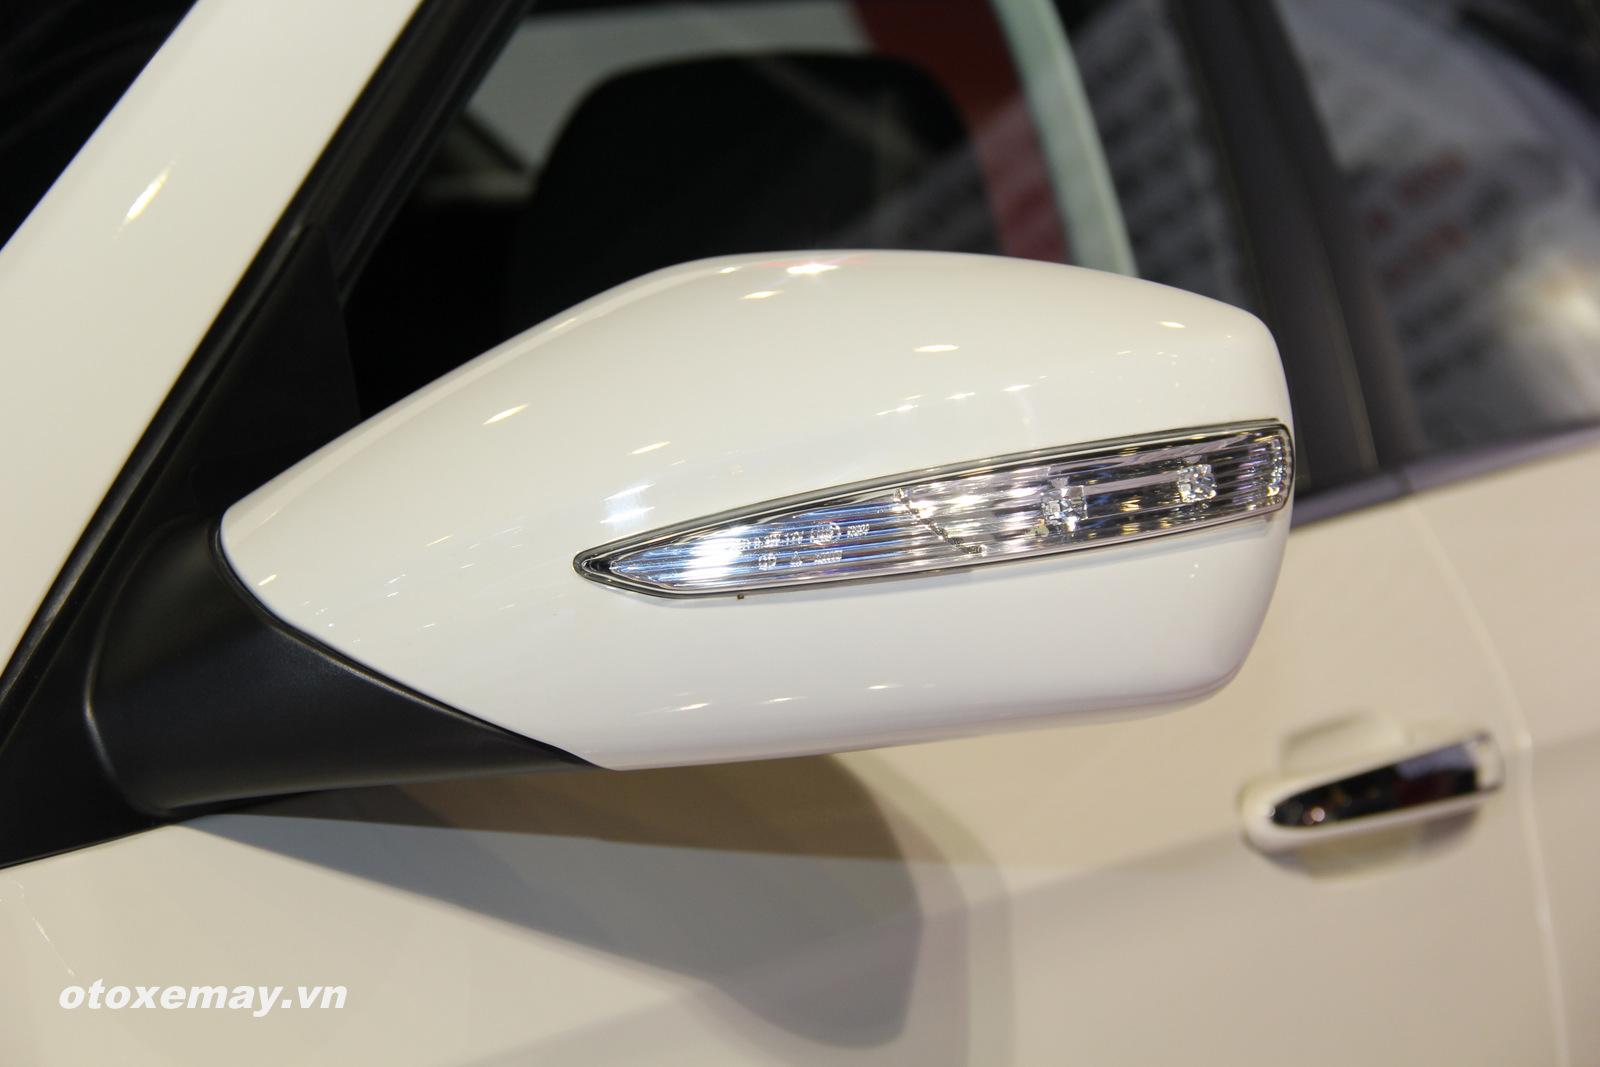 VIMS 2015: Cận cảnh sedan BAIC CC của Trung Quốc 17